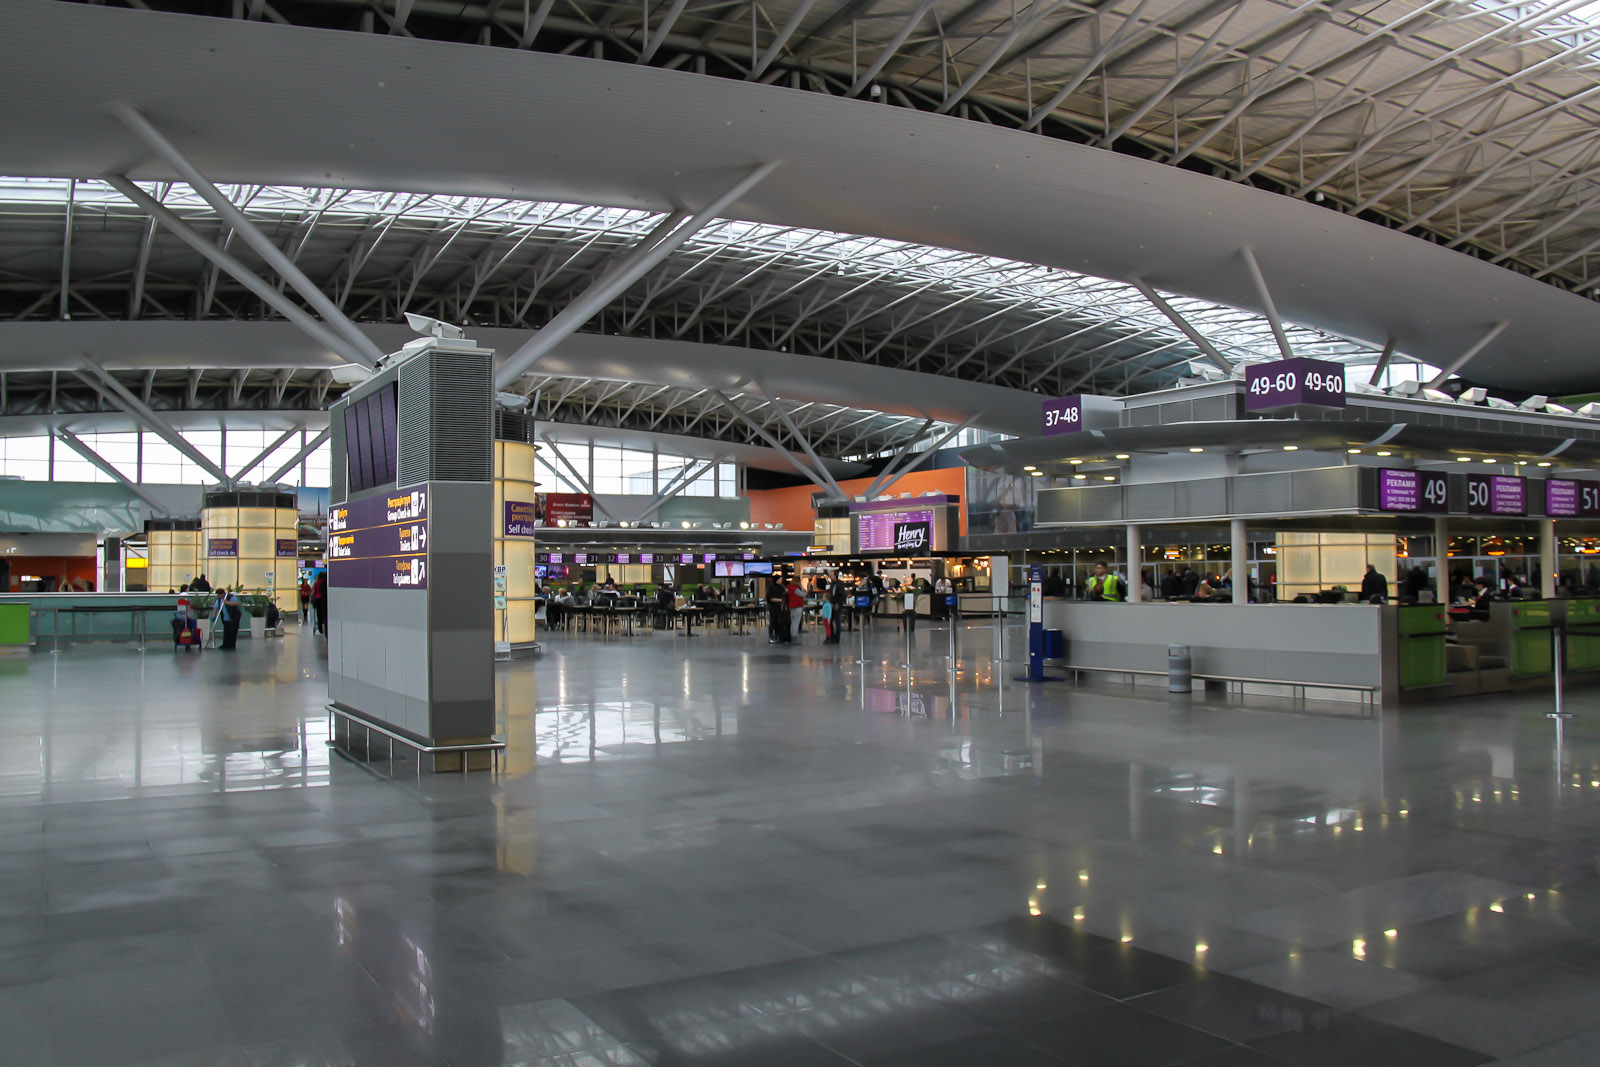 Terminal D of Kyiv Boryspil Airport